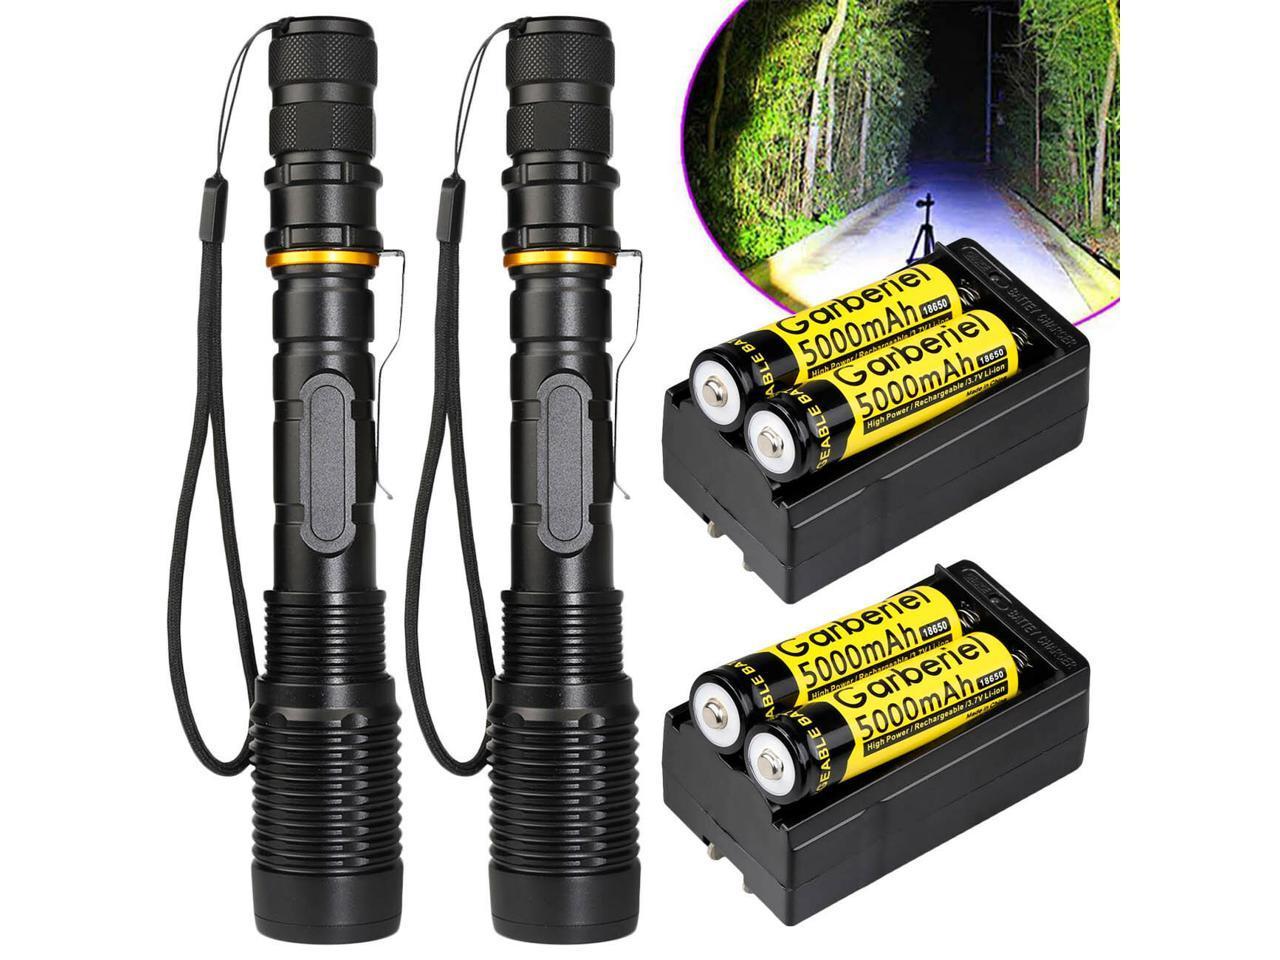 350000Lumens 5X  LED Headlamp Rechargeable Head Light Torch Flashlight Lamp US